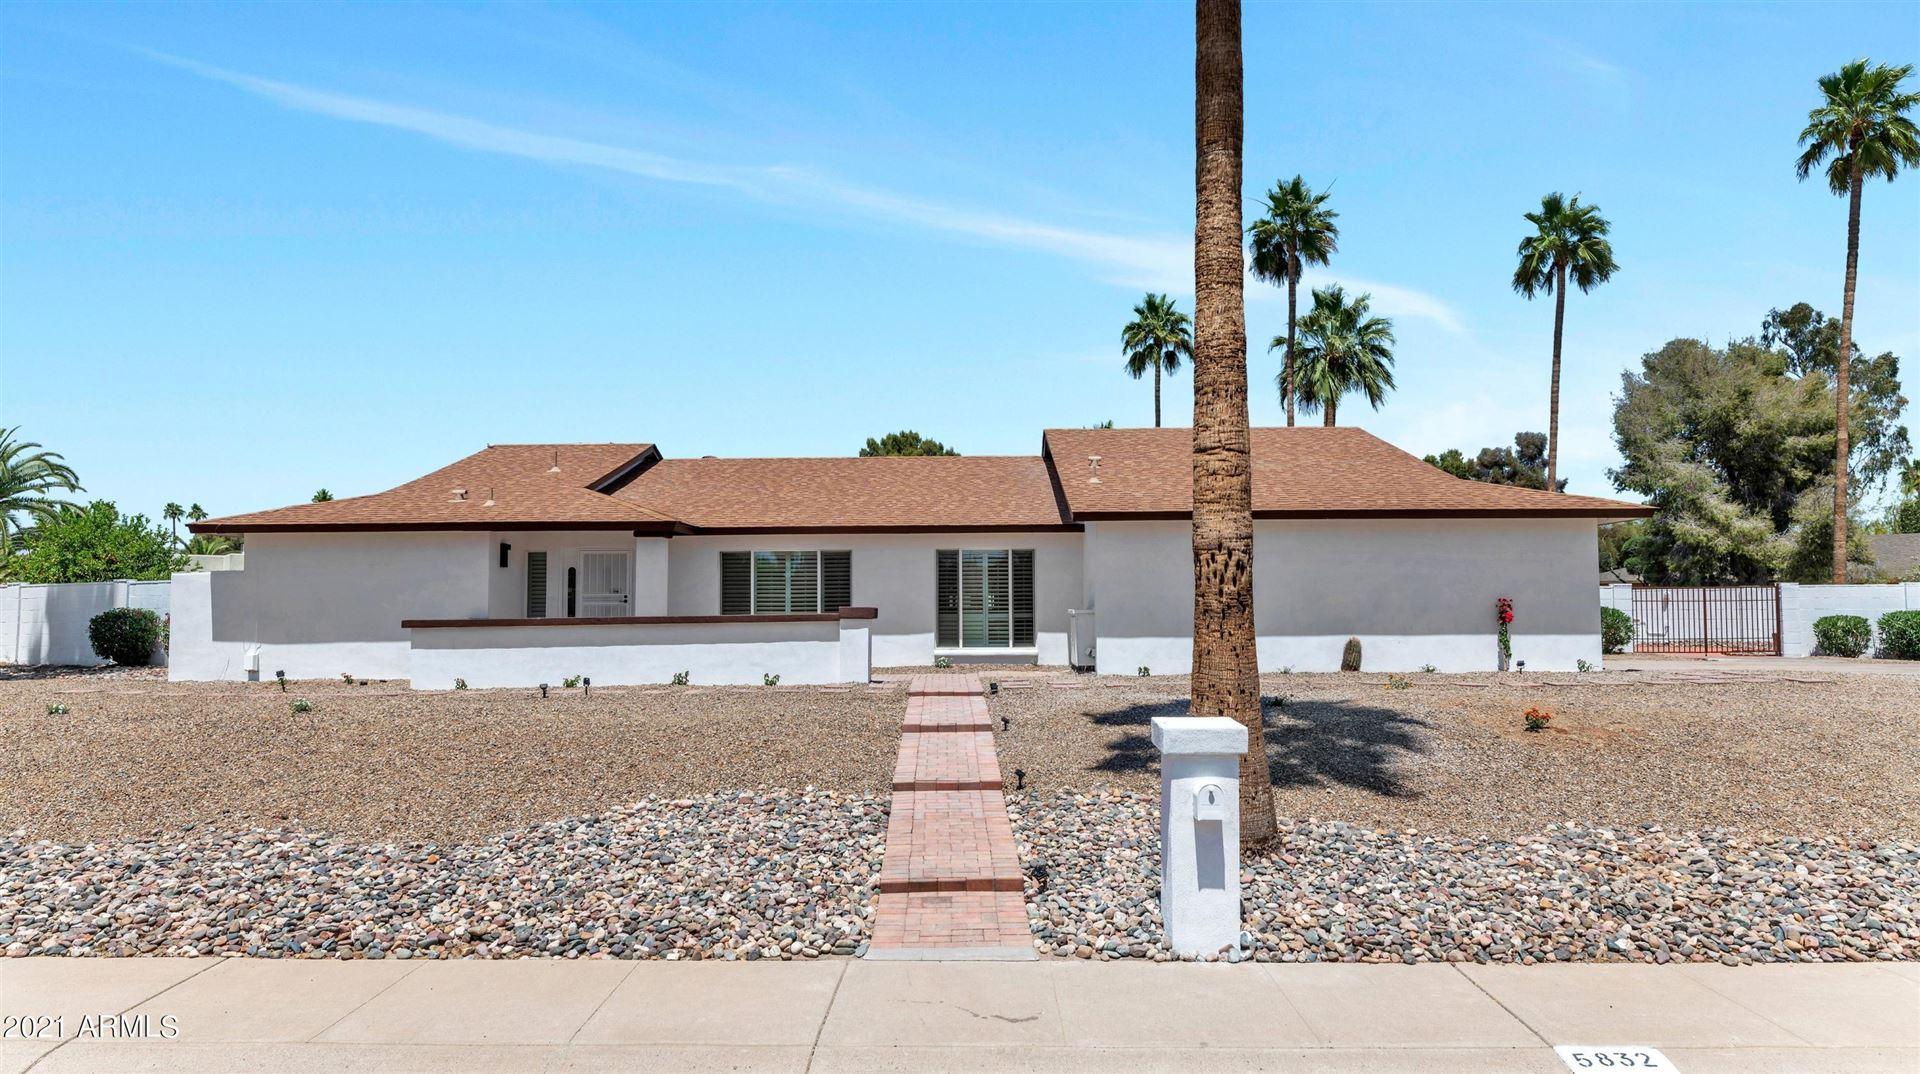 5832 E WINDROSE Drive, Scottsdale, AZ 85254 - MLS#: 6223228